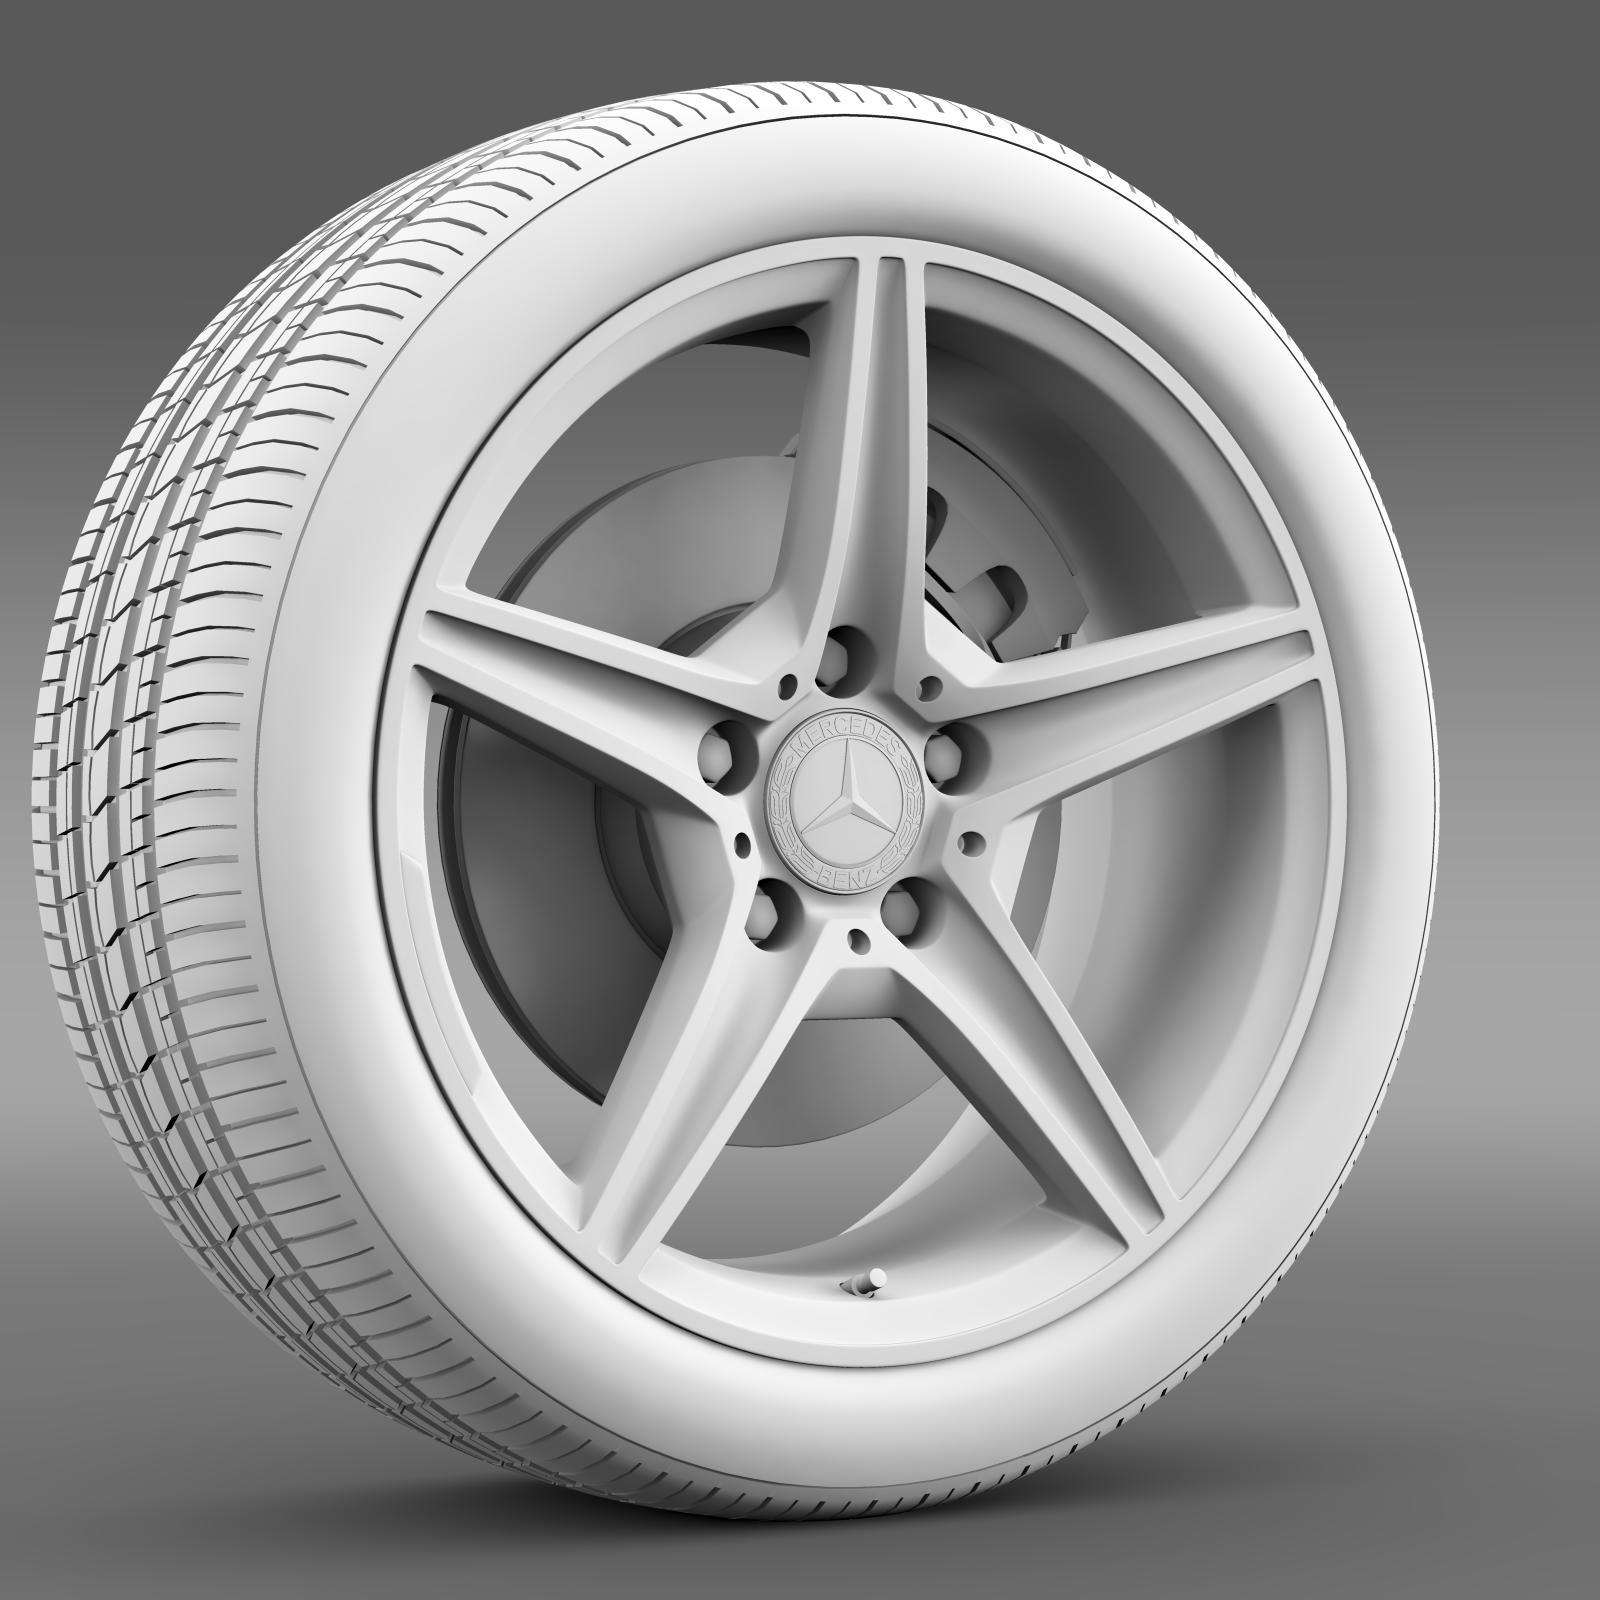 mercedes benz c 400 4matic amg line wheel 3d model 3ds max fbx c4d lwo ma mb hrc xsi obj 210792